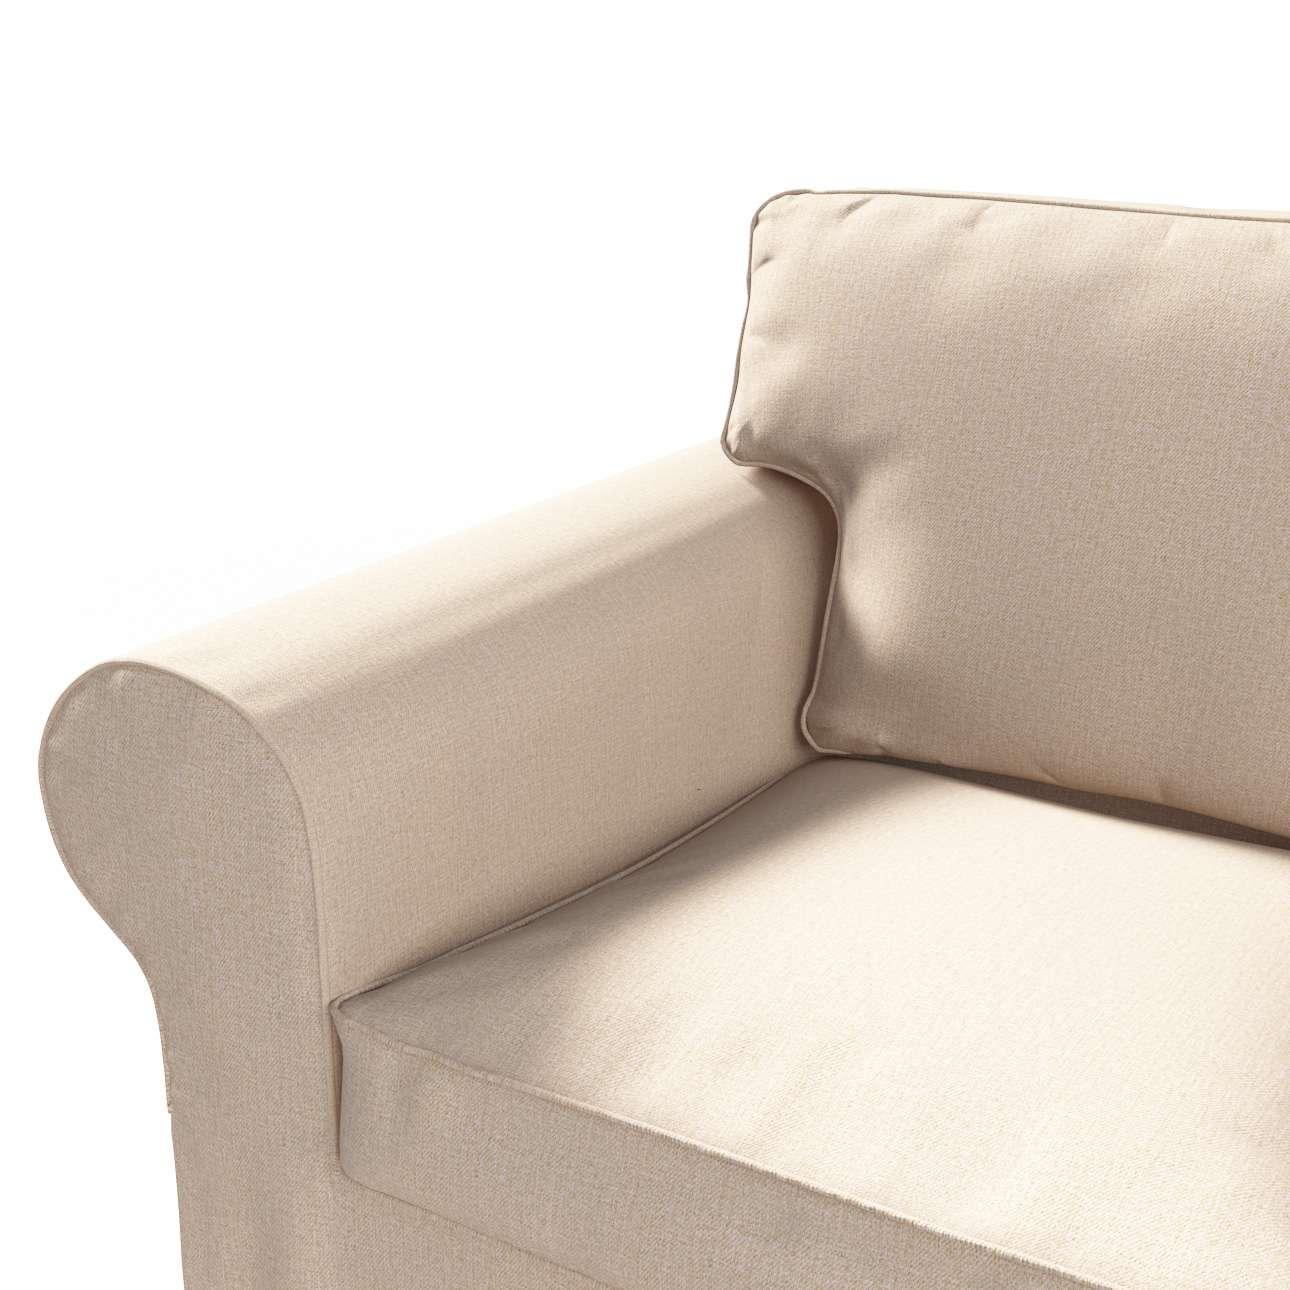 Ektorp 2-Sitzer Schlafsofabezug  ALTES Modell Sofabezug Ektorp 2-Sitzer Schlafsofa altes Modell von der Kollektion Edinburgh , Stoff: 115-78